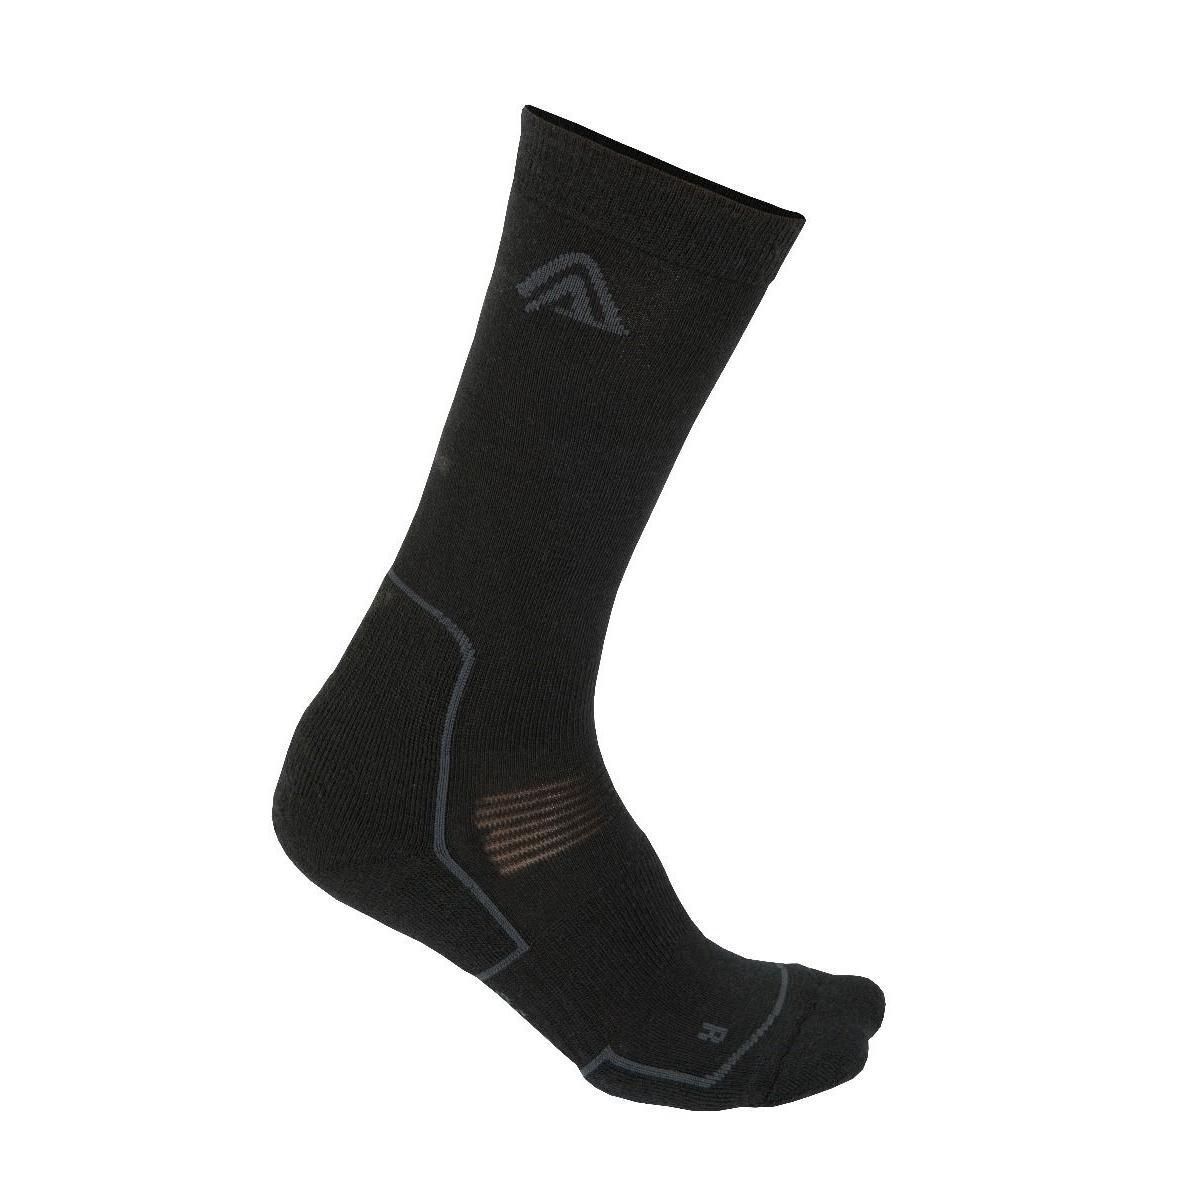 Image of Aclima Trekking Socks - jet black